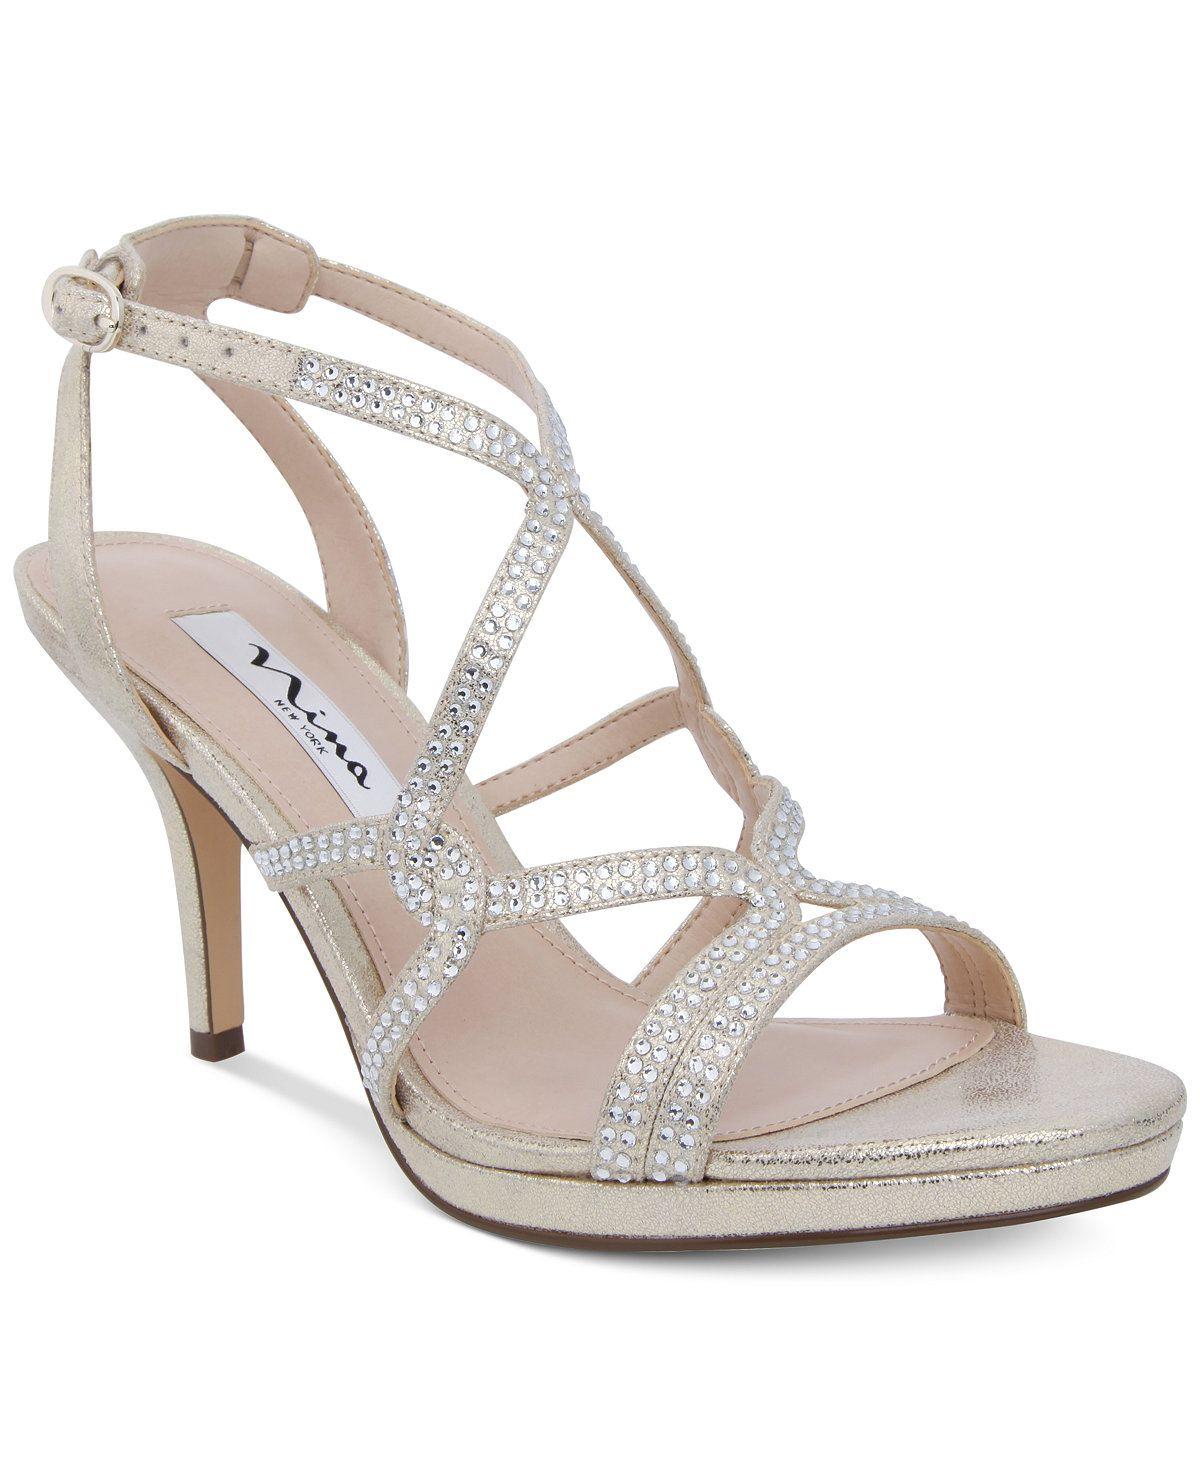 b66de1b90 Nina Varsha Strappy Evening Sandals - Heels - Shoes - Macy's [www.macys.com]